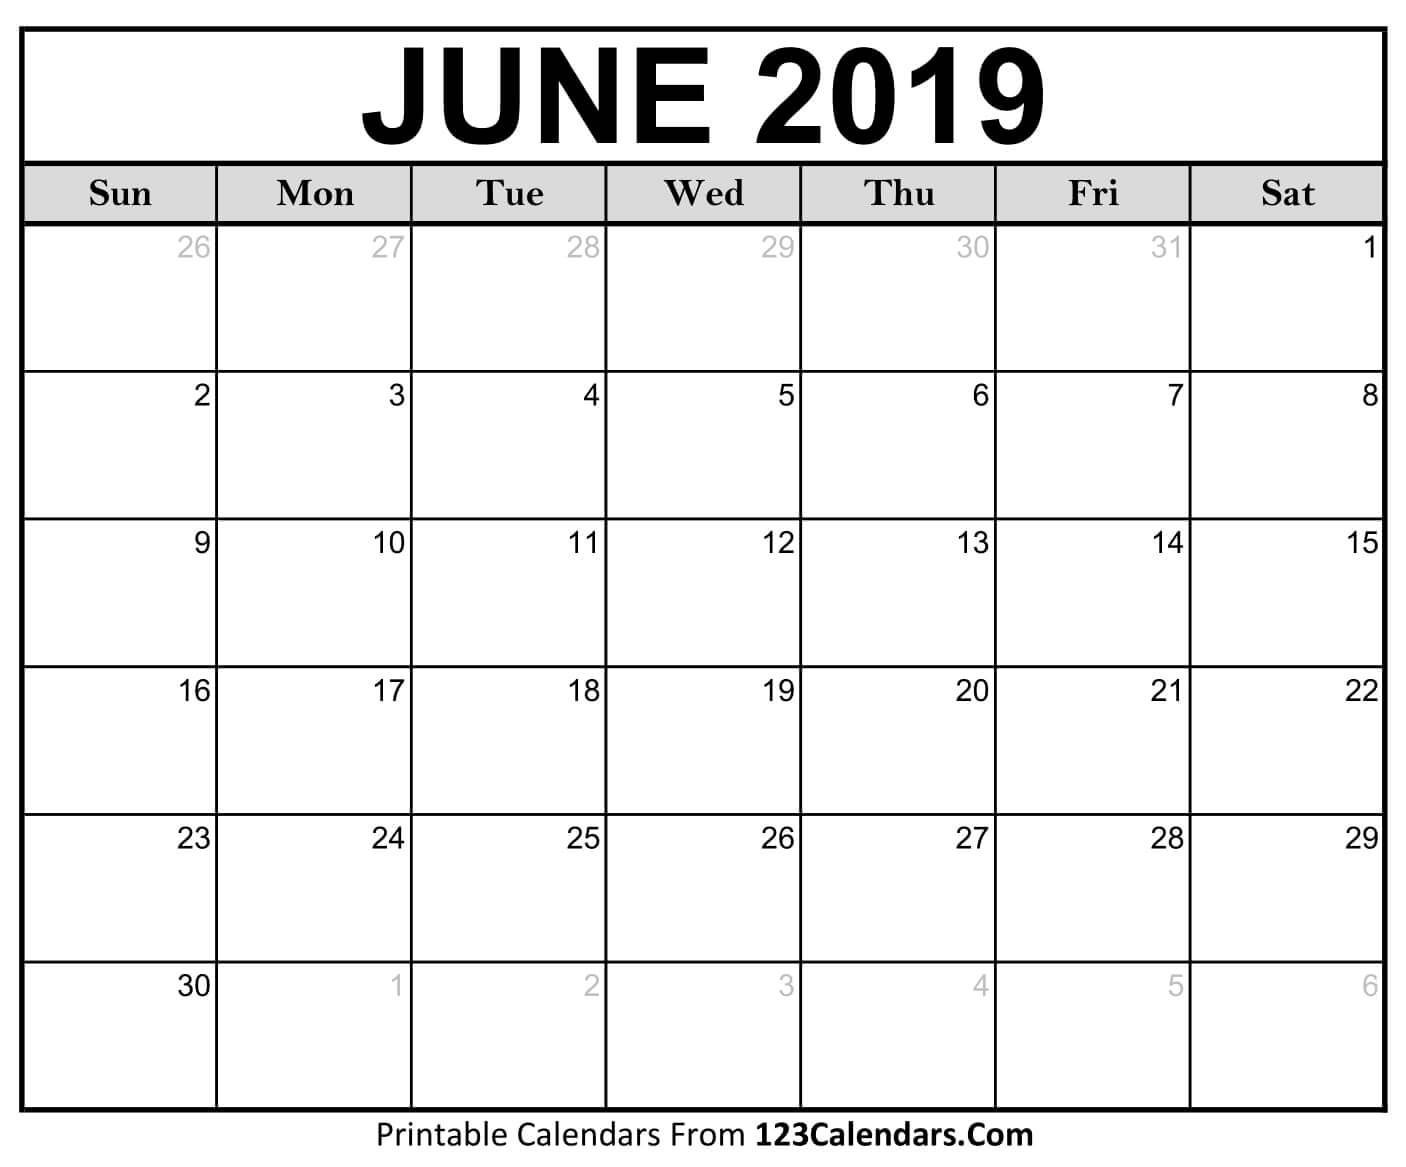 Printable June 2019 Calendar Templates – 123Calendars Printable January 2019 Calendar 123Calendars